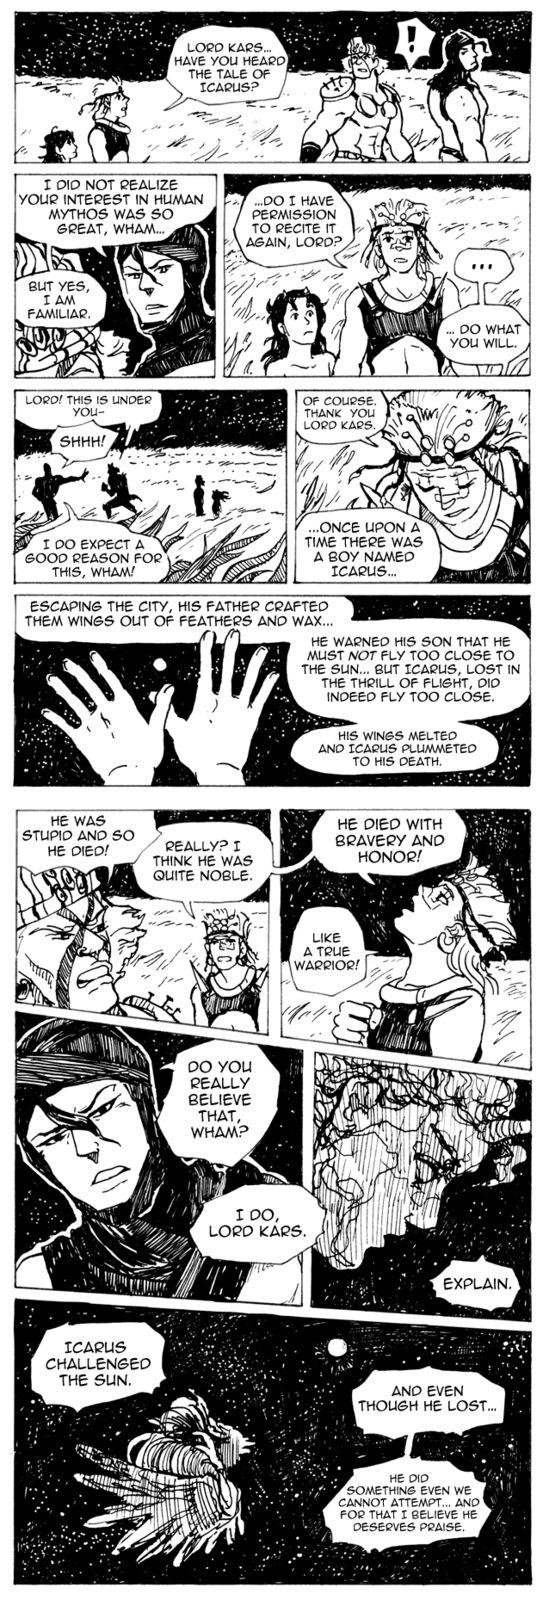 Tags: Anime, Comic, JoJo no Kimyou na Bouken, Cars (Jojo), Part 2: Battle Tendency